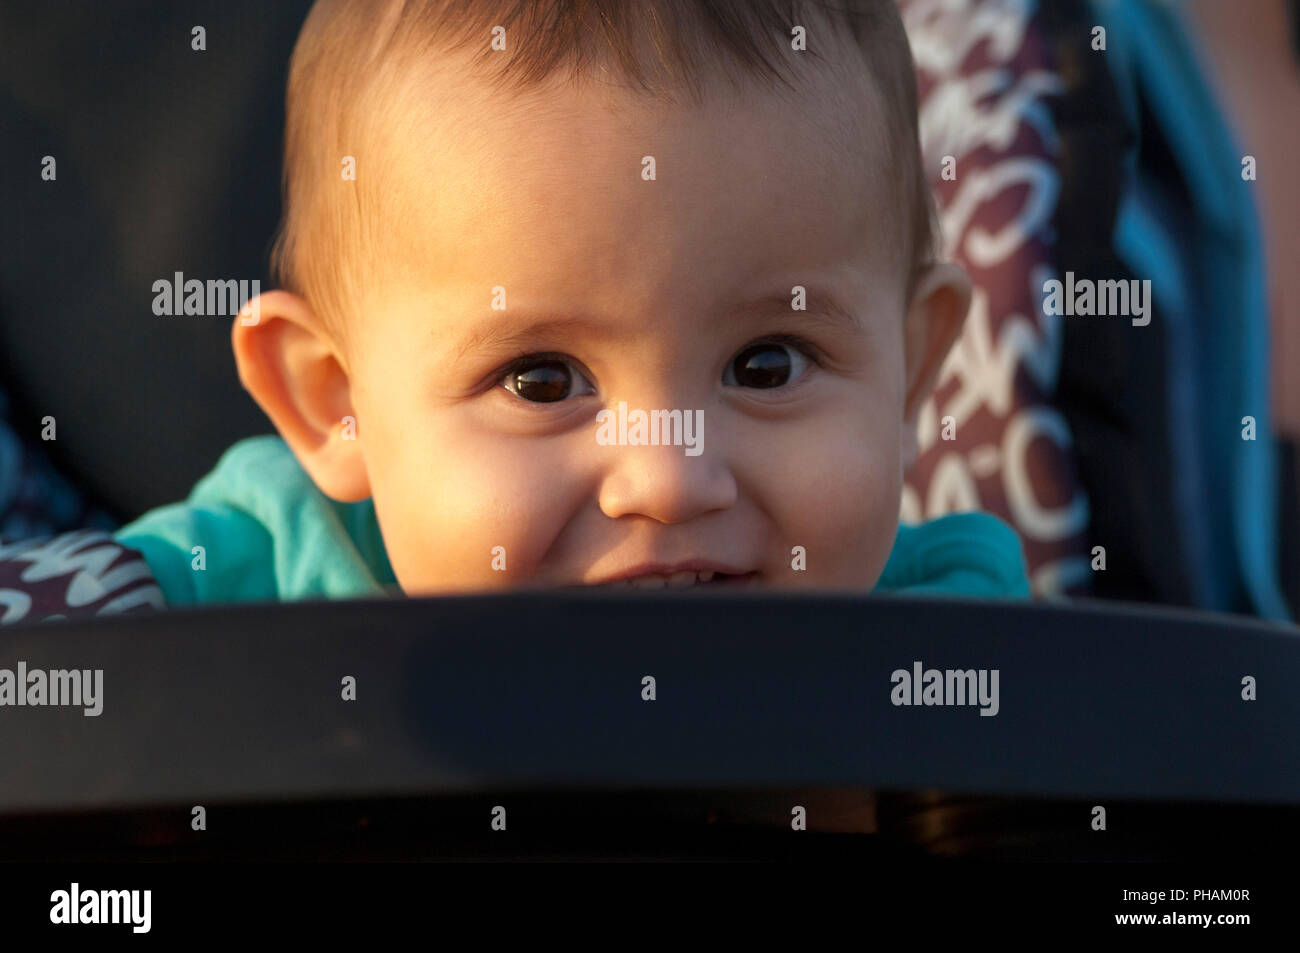 Look of baby Regard d'enfant - Stock Image